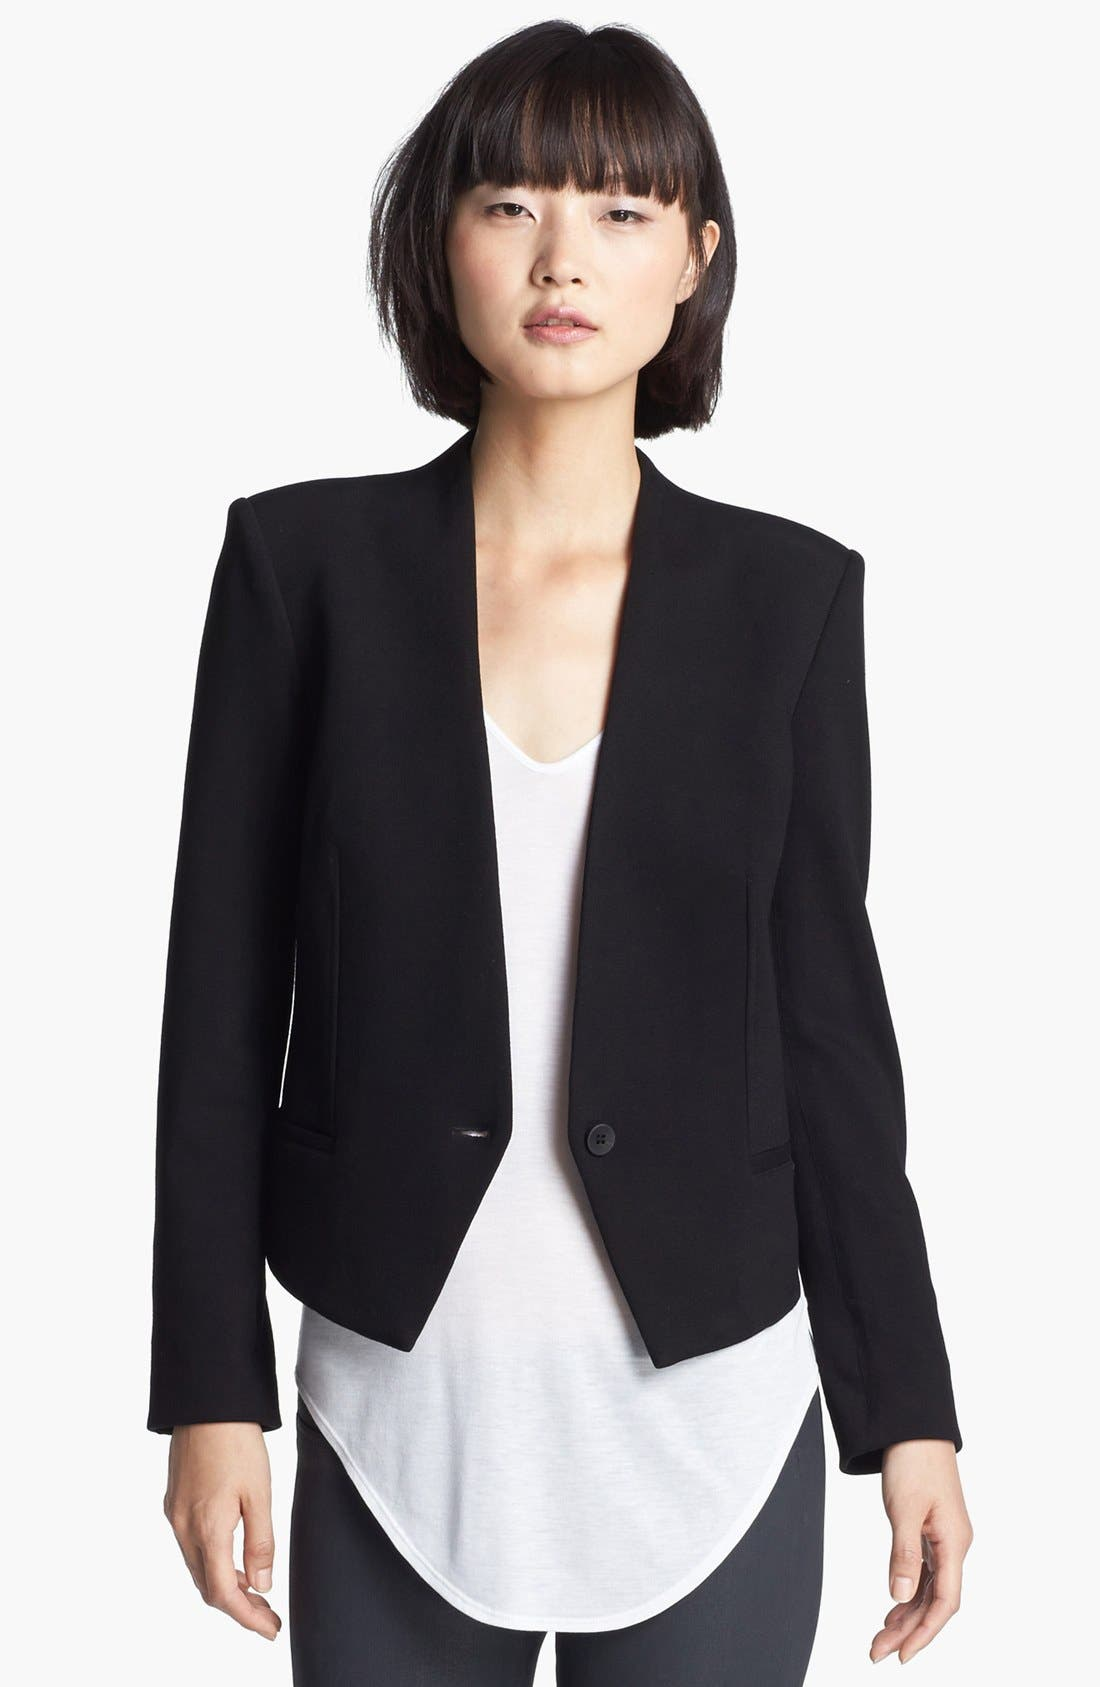 Alternate Image 1 Selected - HELMUT Helmut Lang 'Gala' Knit Tuxedo Blazer